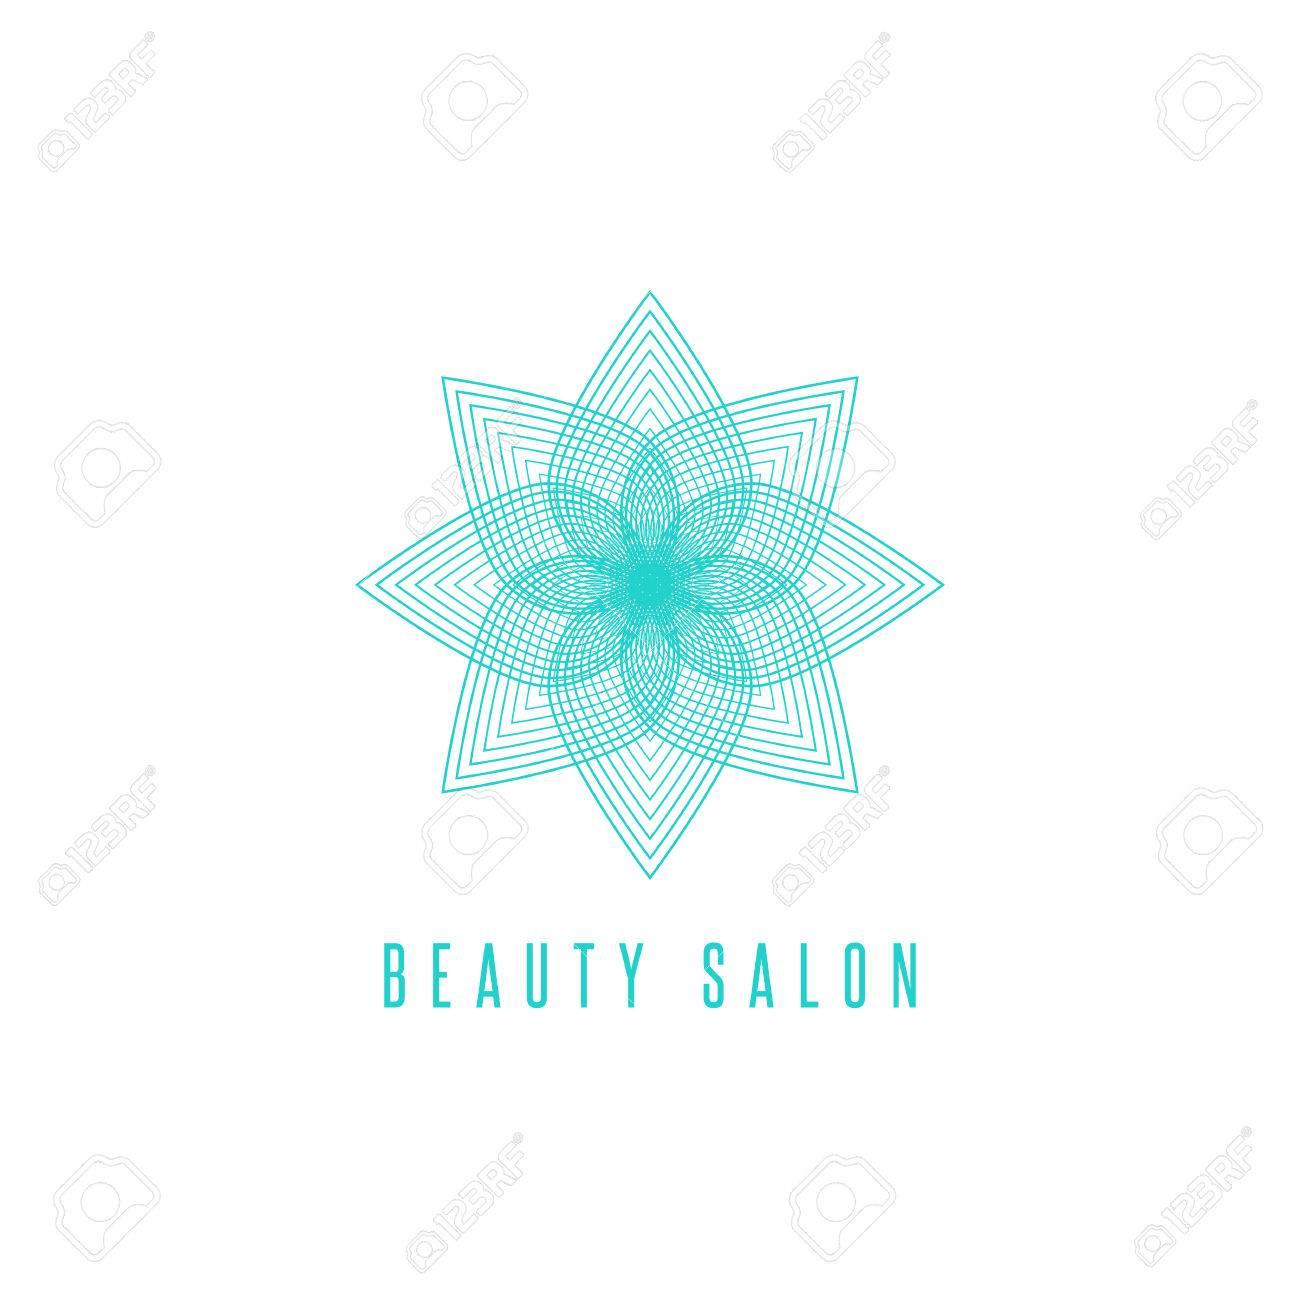 Flower Logo Monogram, Thin Line Style Floral Beauty Salon Emblem ...